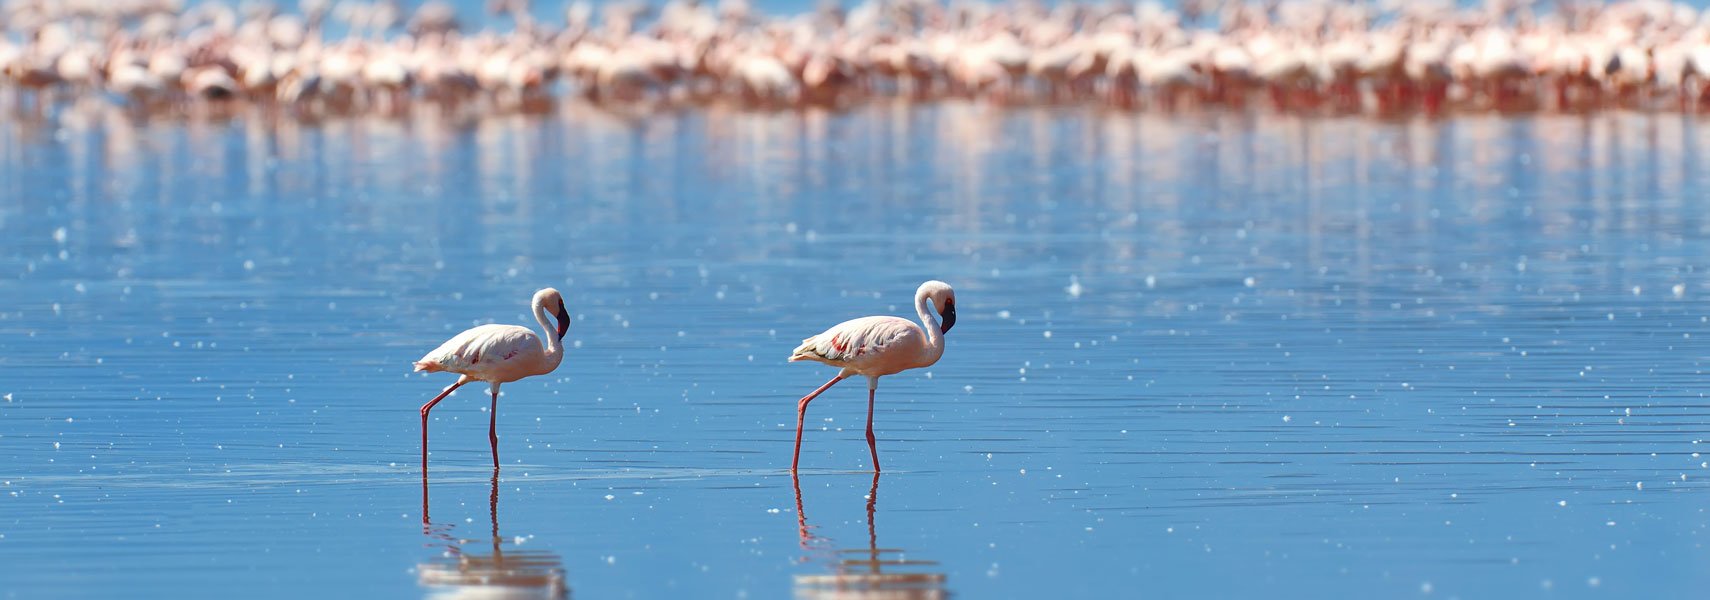 nakuru-lake-flamingos